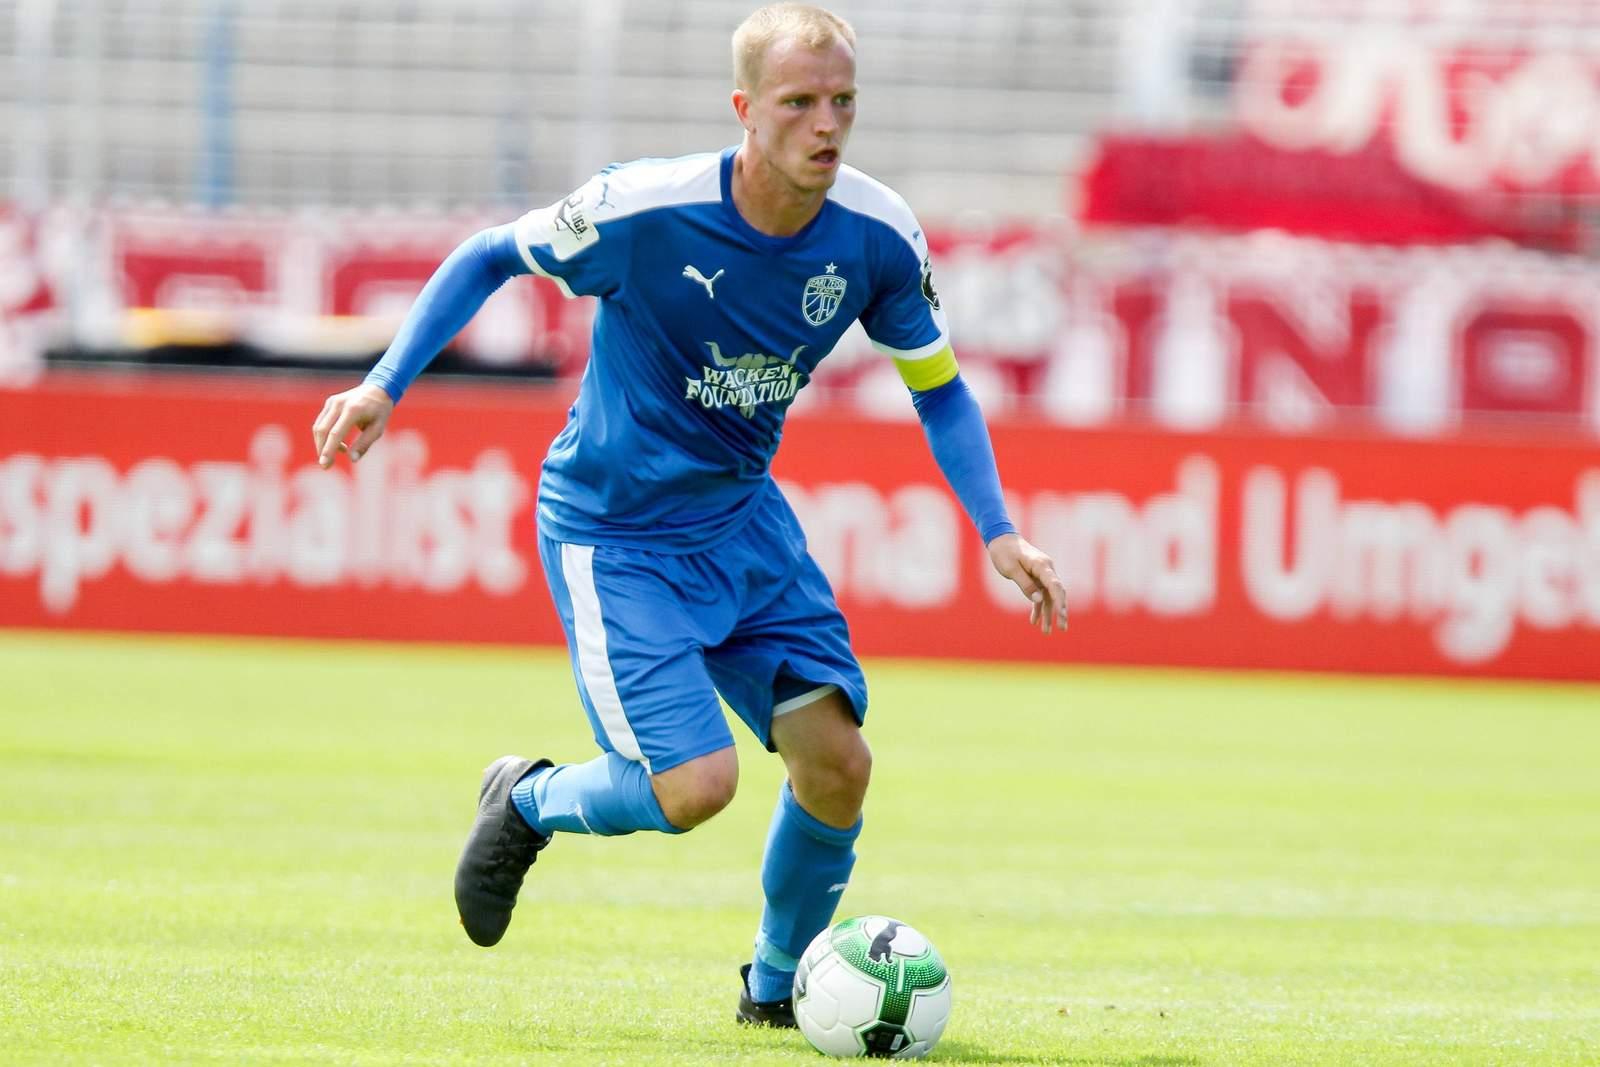 FCC-Spieler René Eckhardt